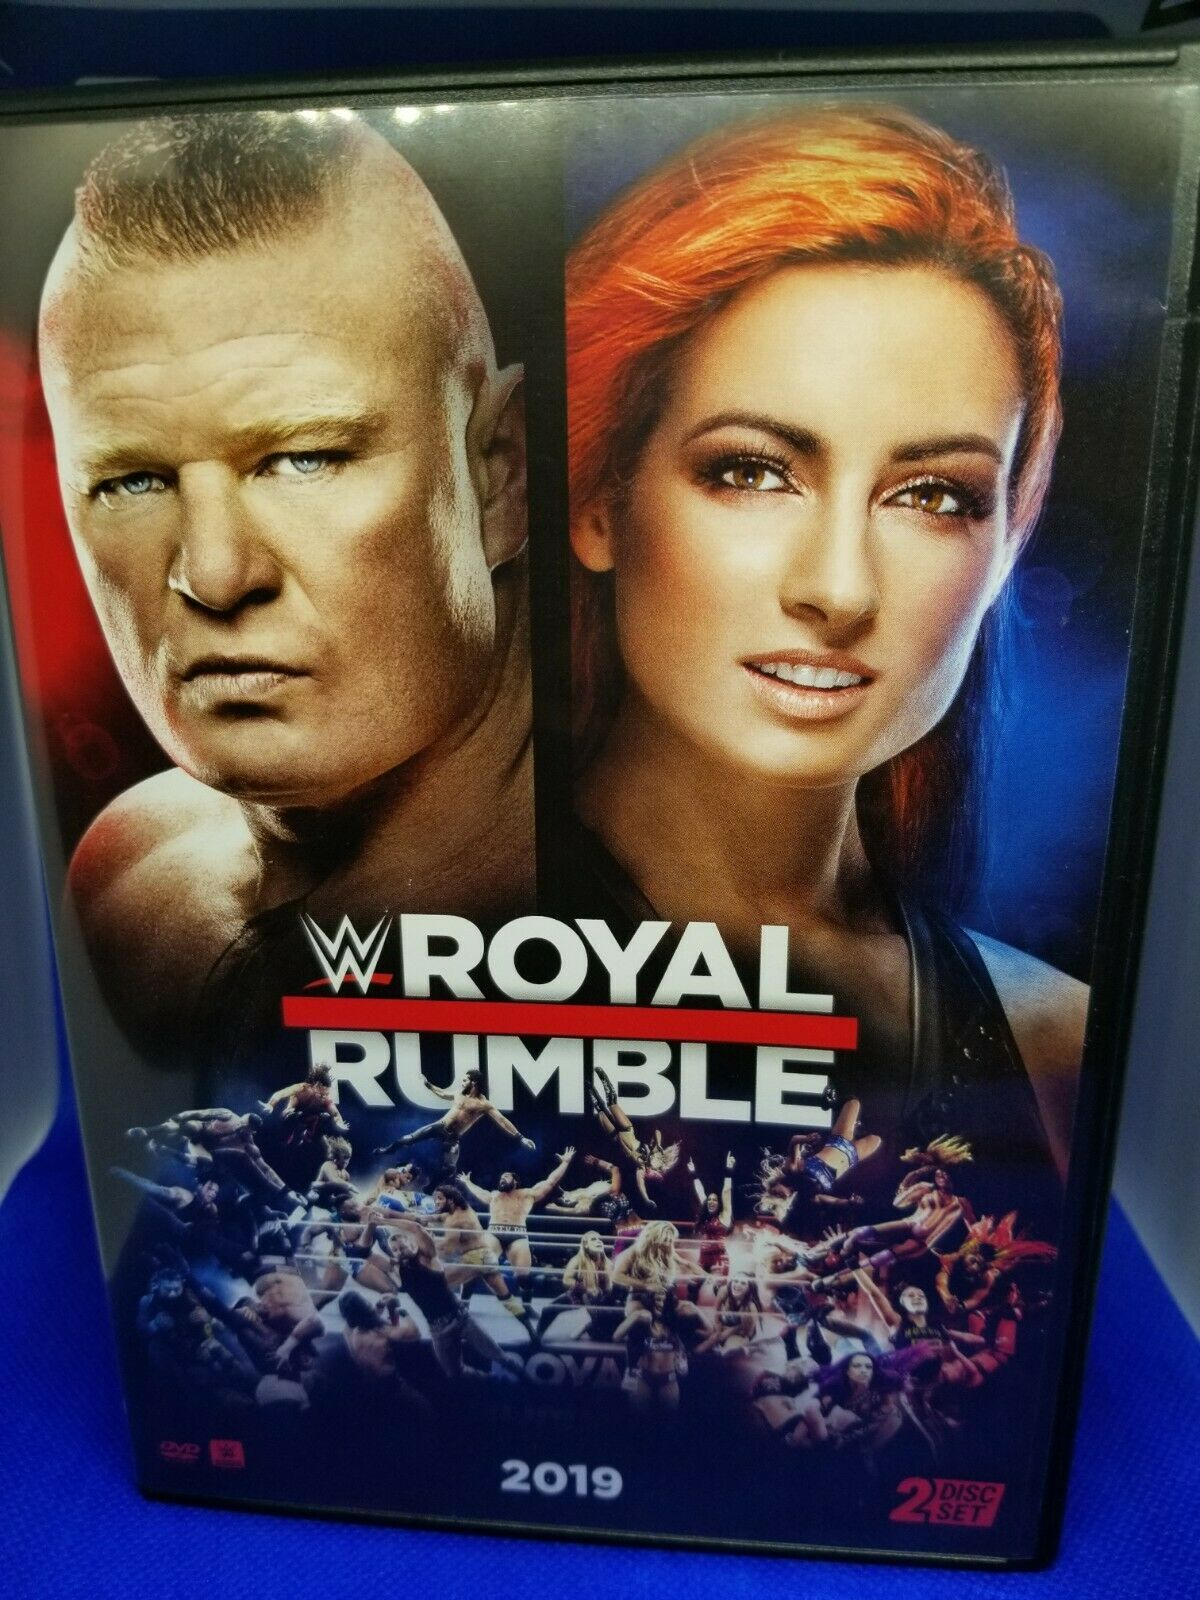 WWE Royal Rumble nopeus dating